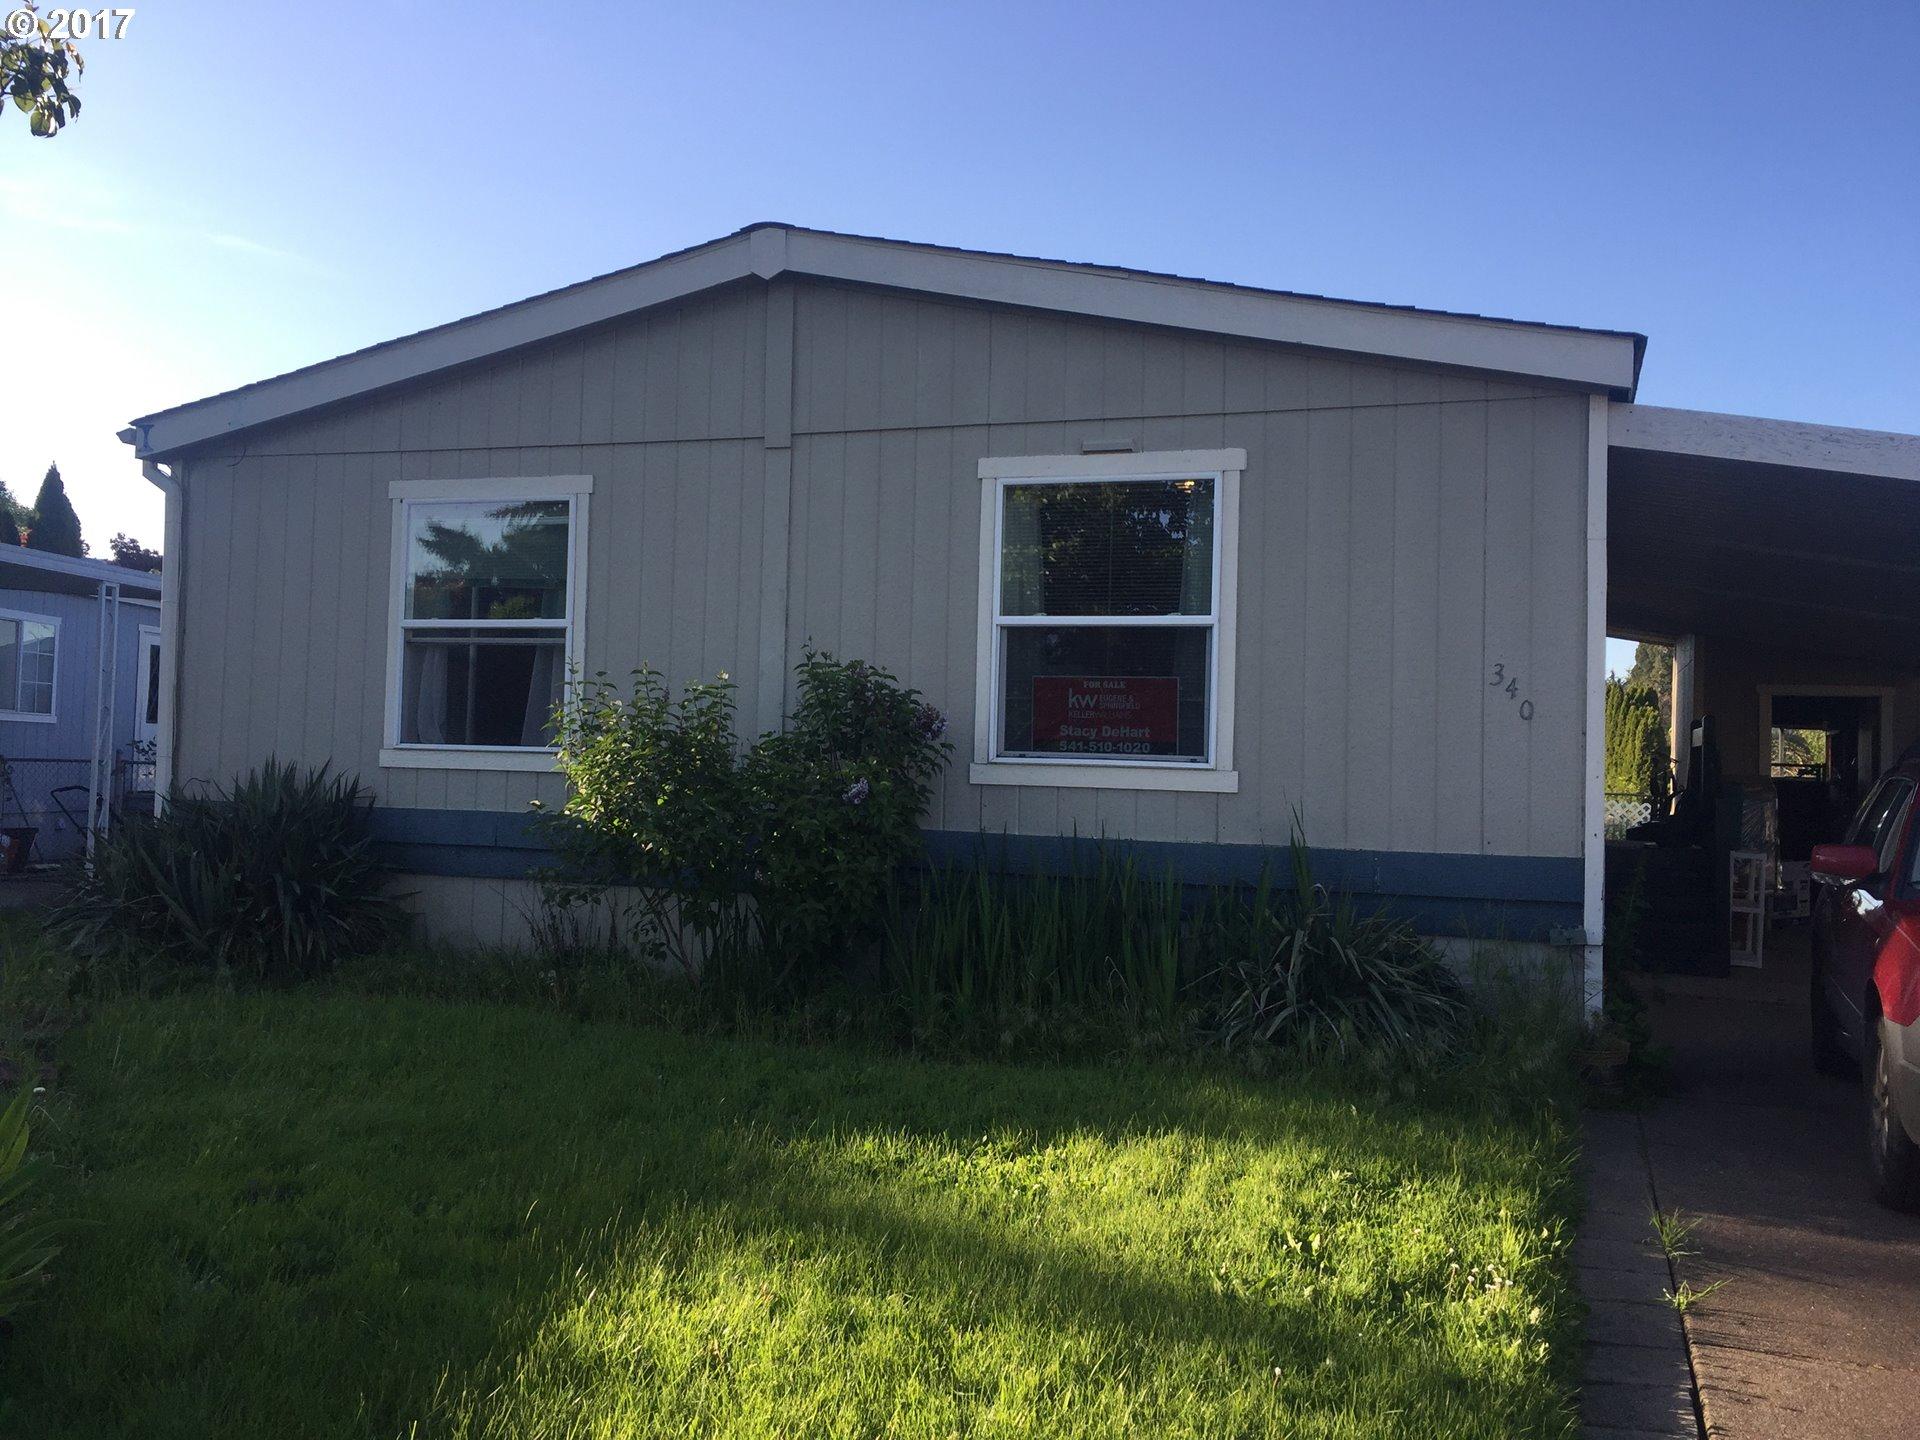 340 ARCHIE ST, Eugene, OR 97402